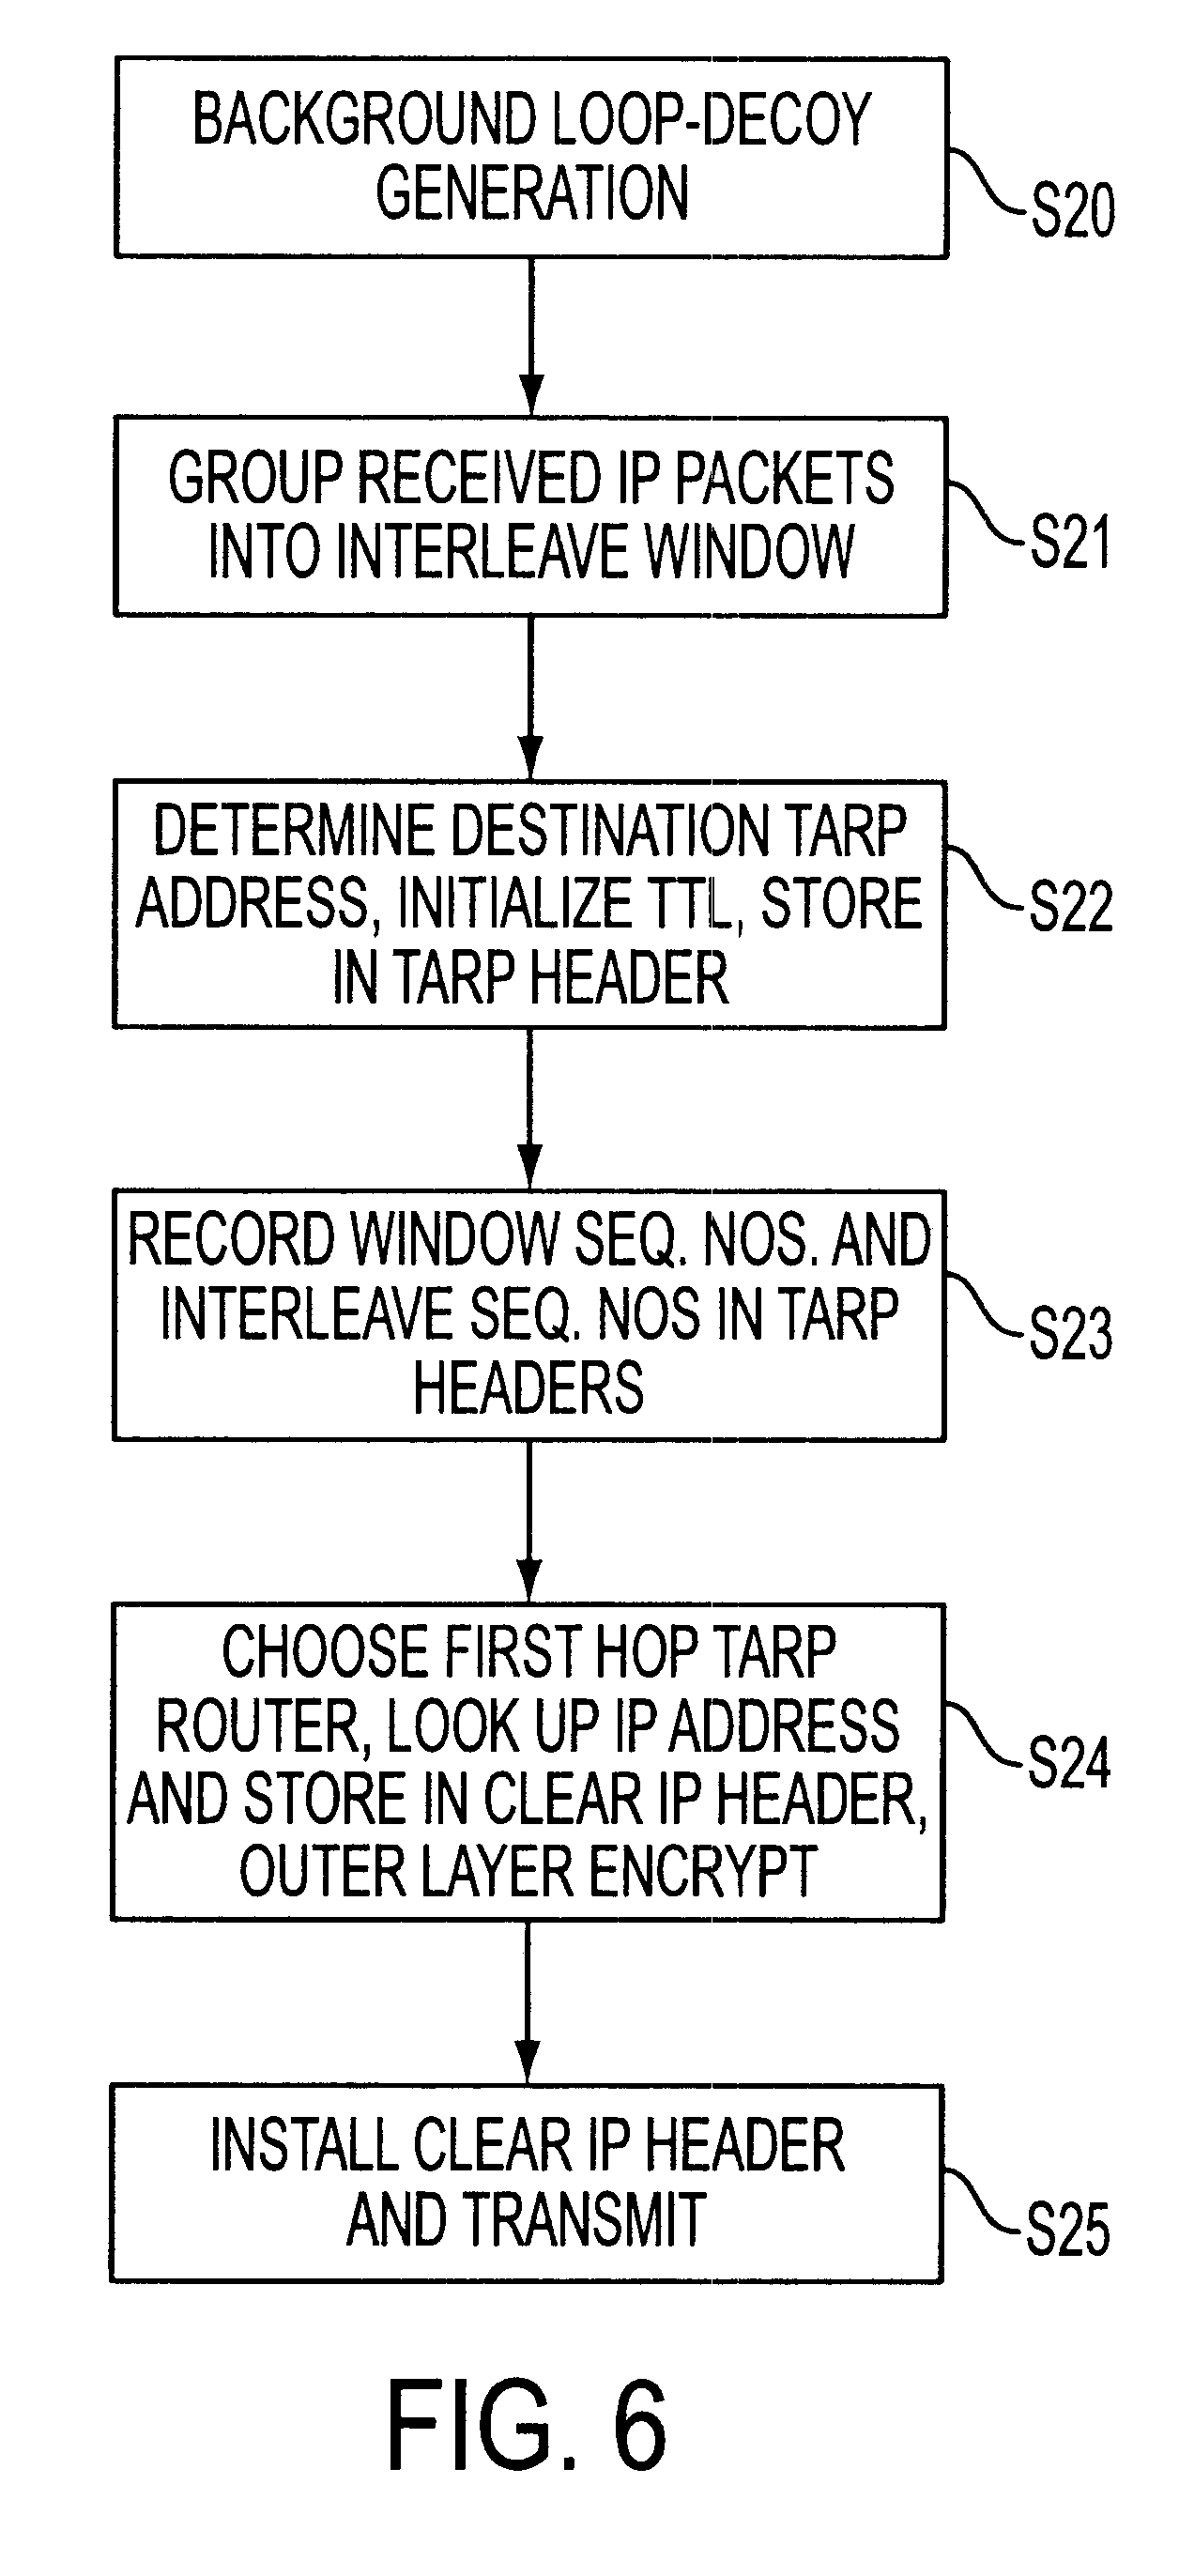 Patent US 6,502,135 B1